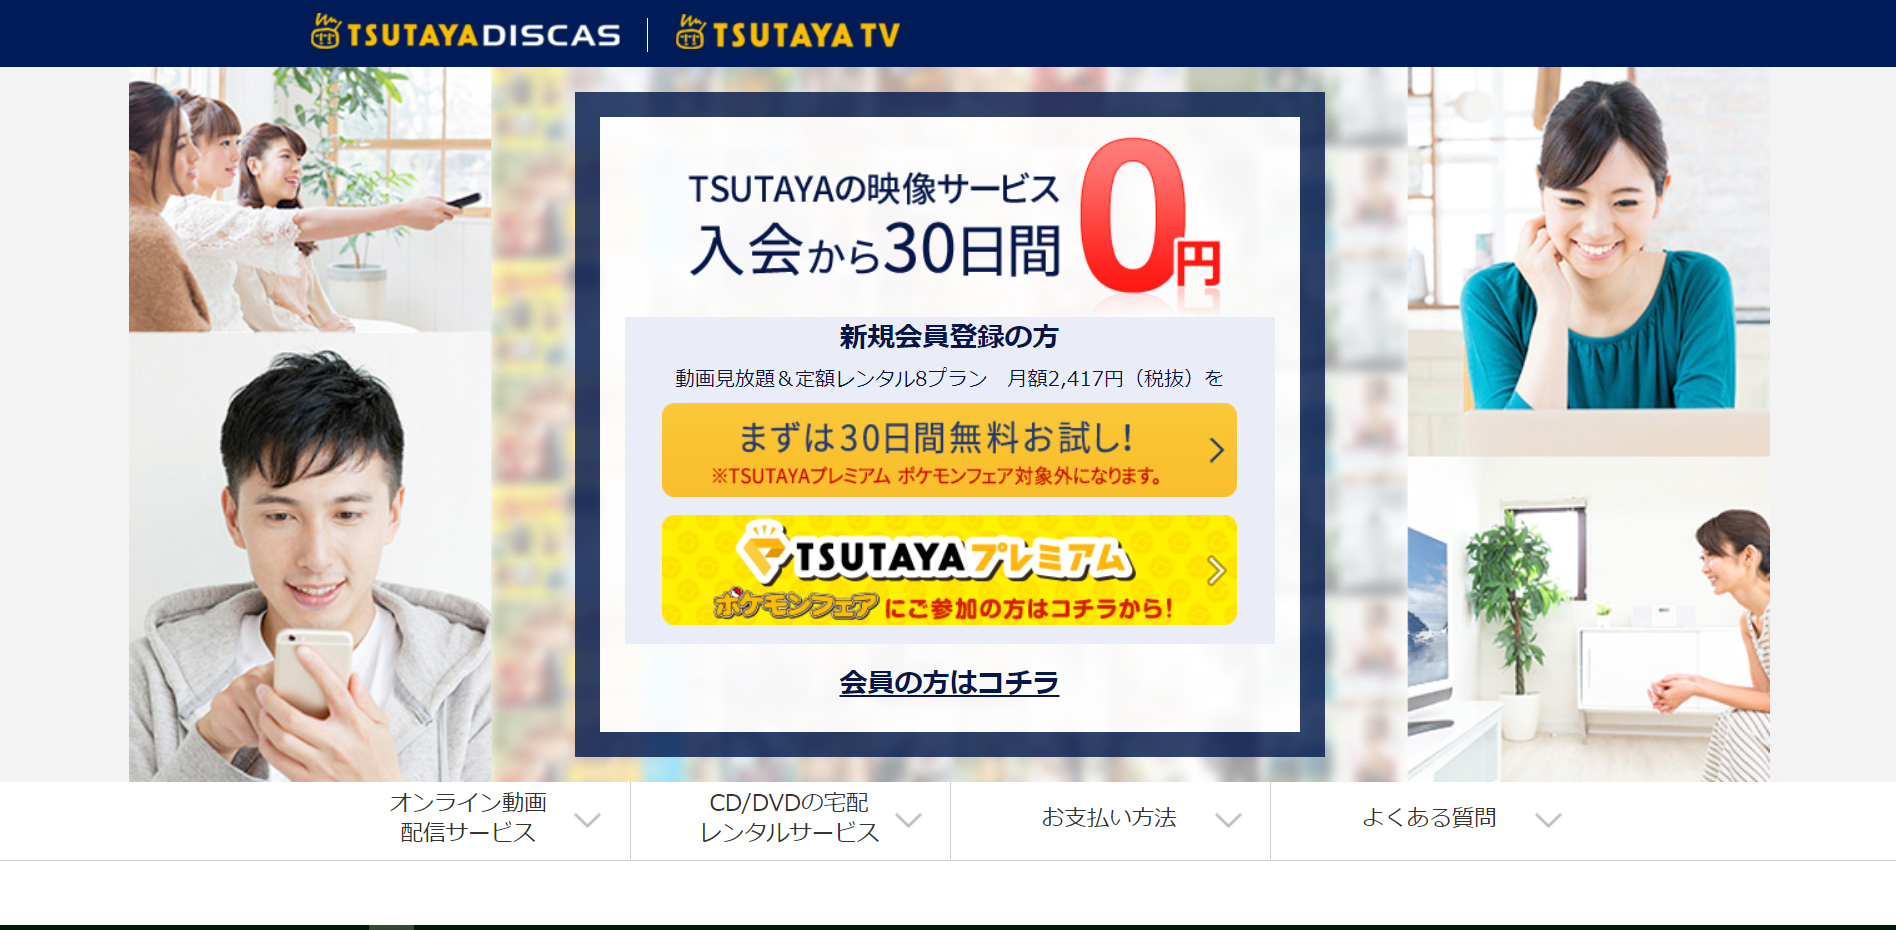 tsutaya discas/tsutaya tv:30日間無料で使い放題評価 – 動画簡単navi